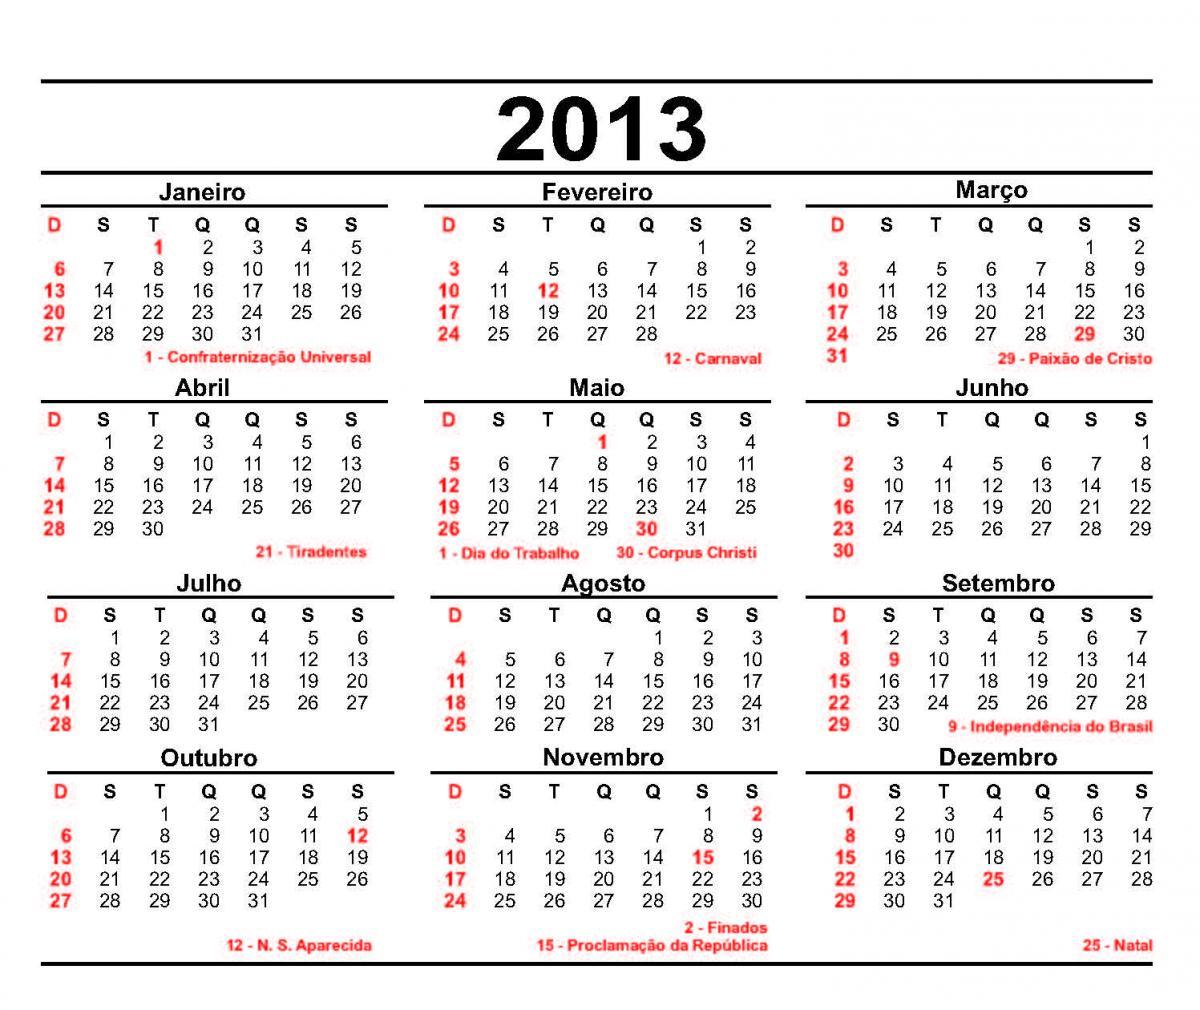 Calendário 2013 Feriados Calendário 2013 – Feriados